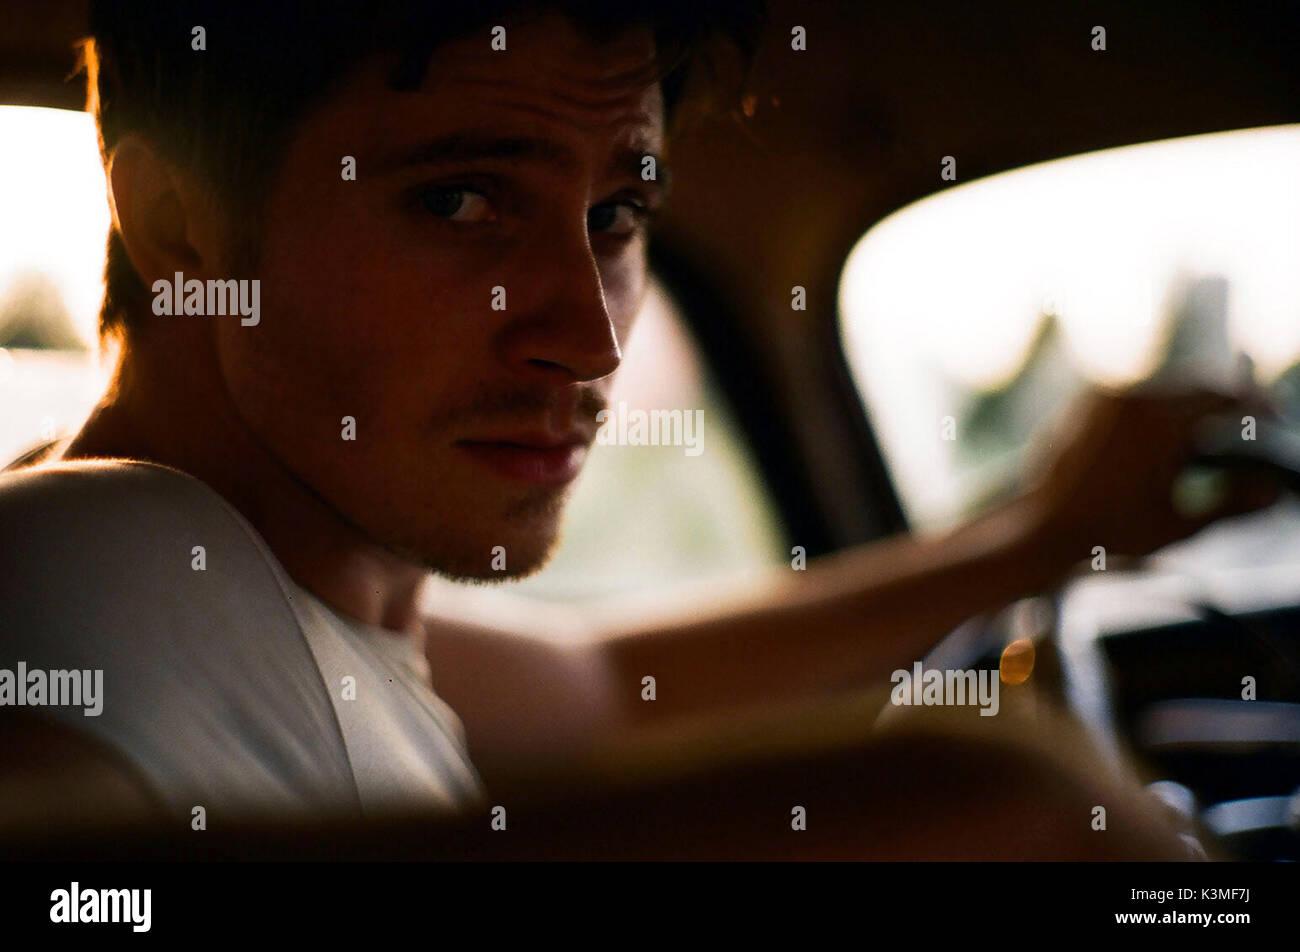 ON THE ROAD [US 2012] GARRETT HEDLUND     Date: 2012 - Stock Image